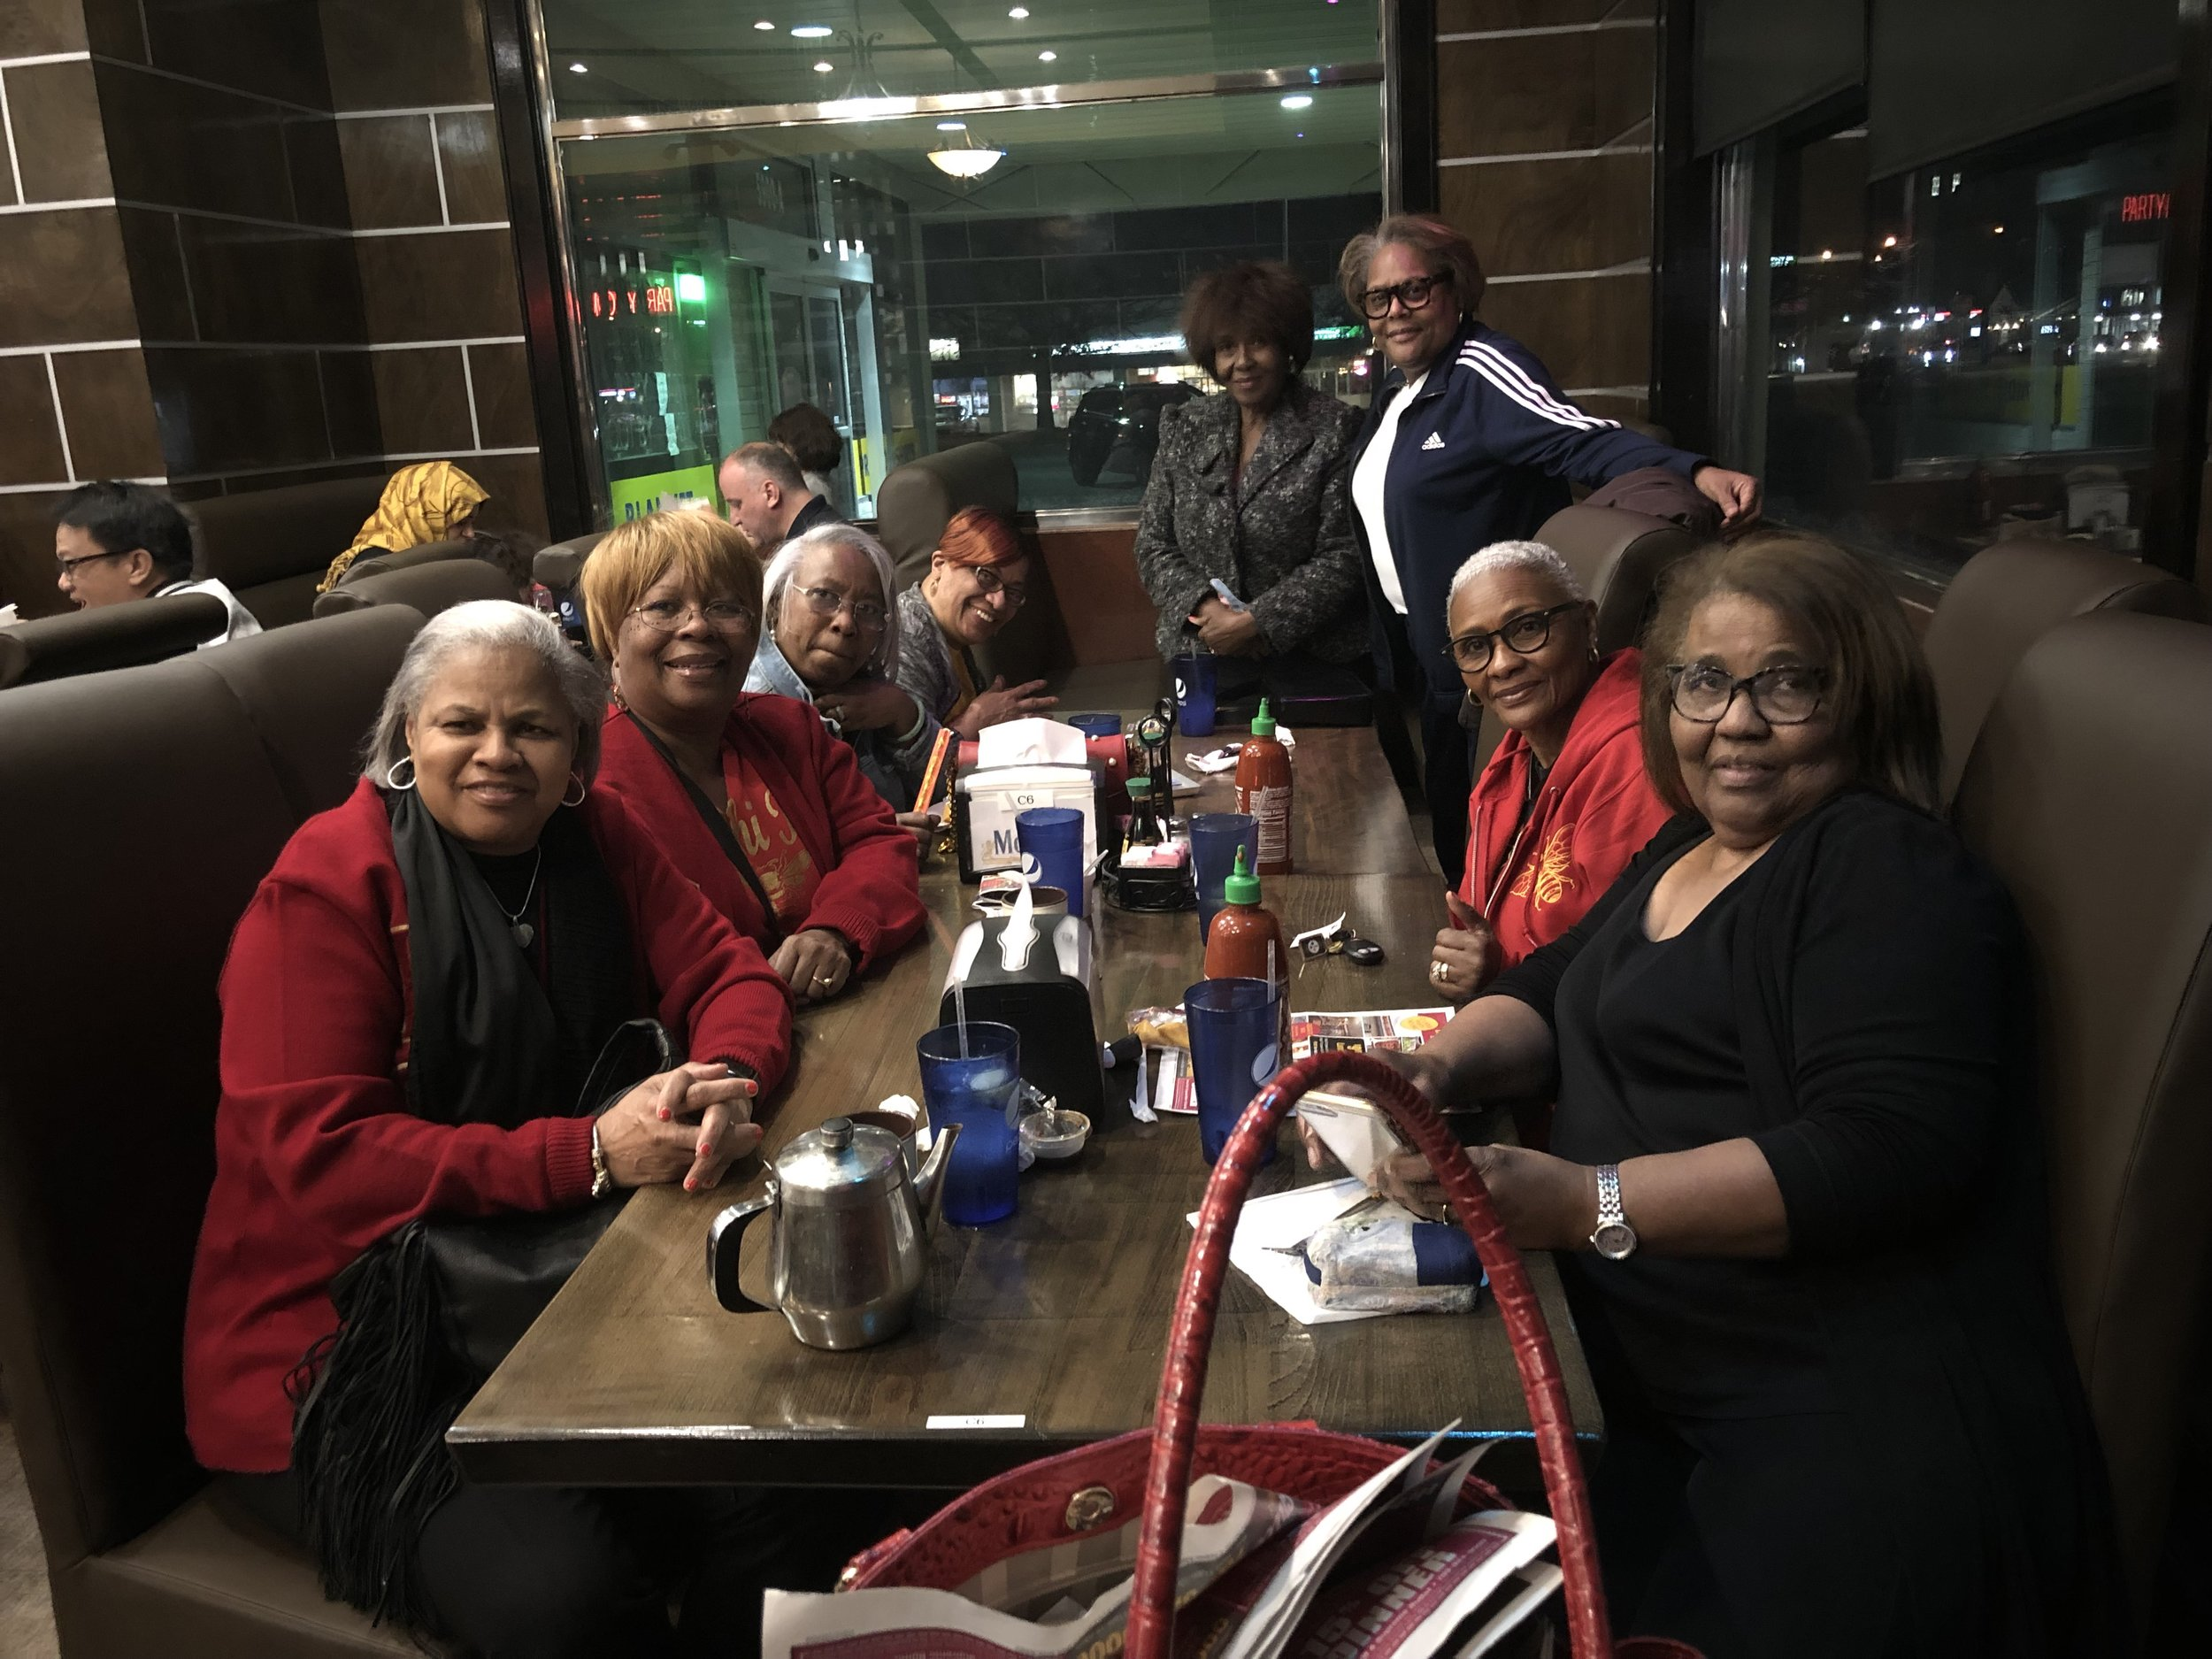 Sorors fellowship during the National Executive Board Meeting in Arlington, VA, March 2019